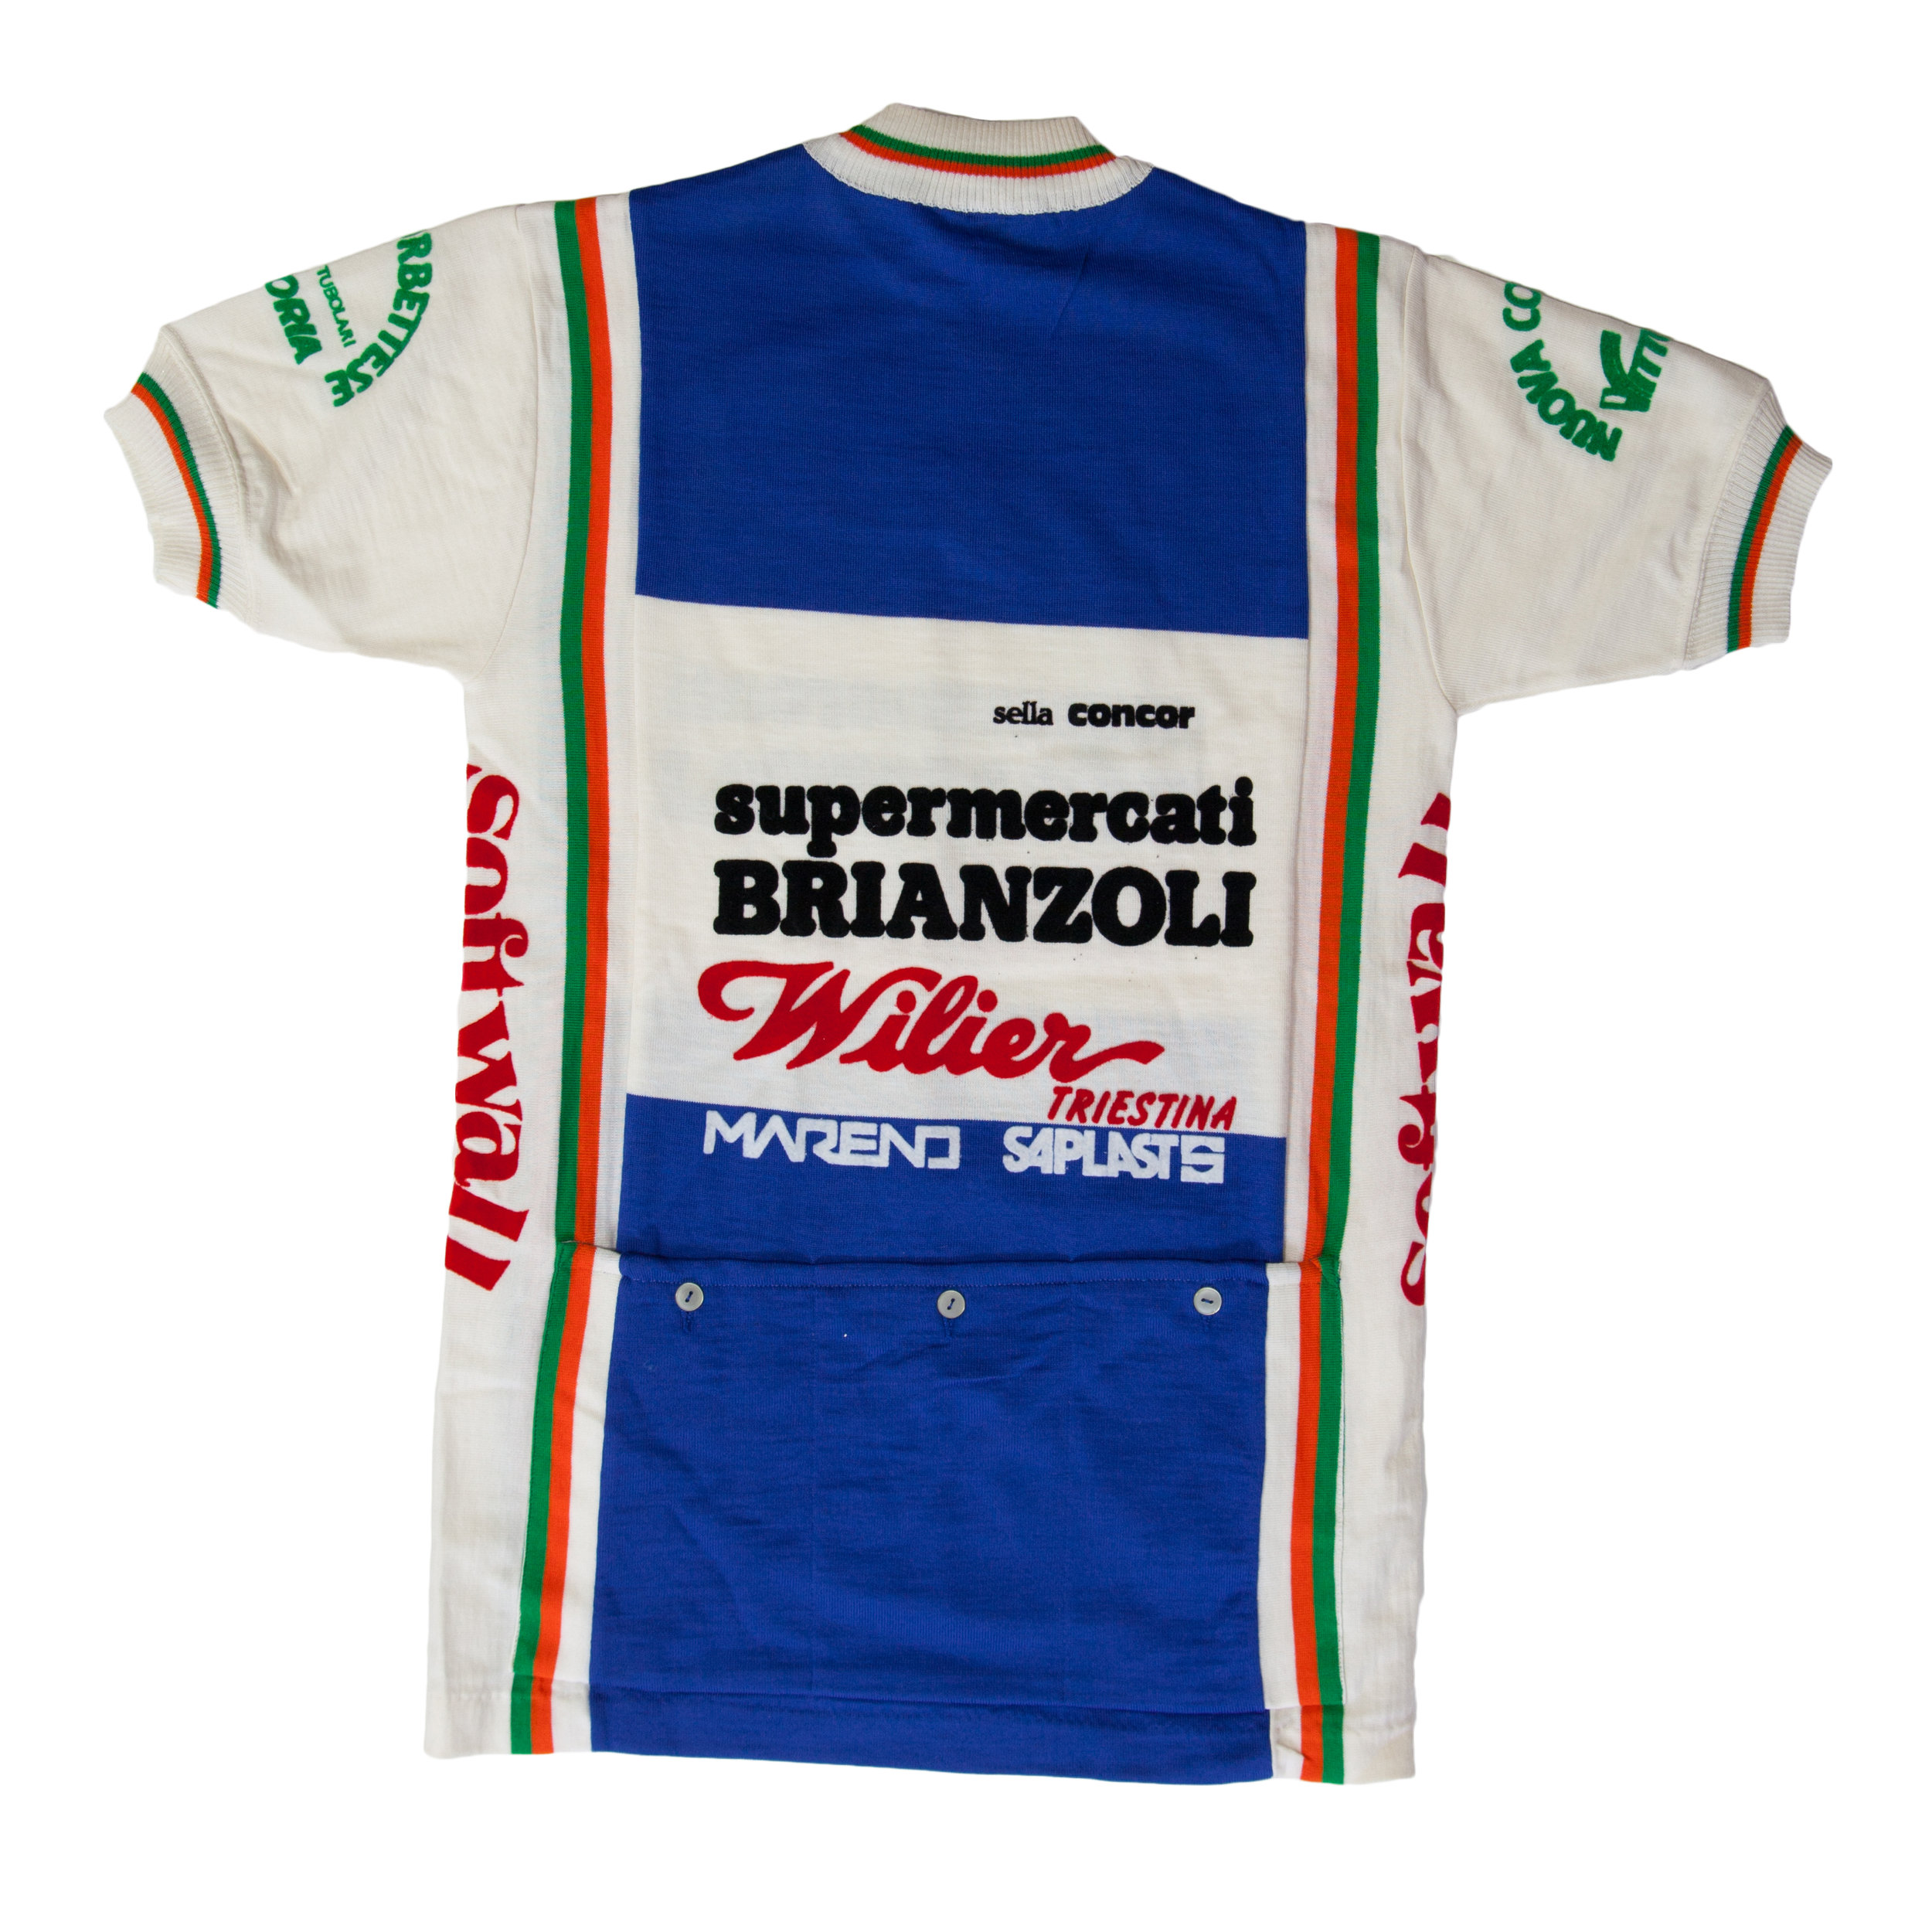 Brianzoli_Back.jpg